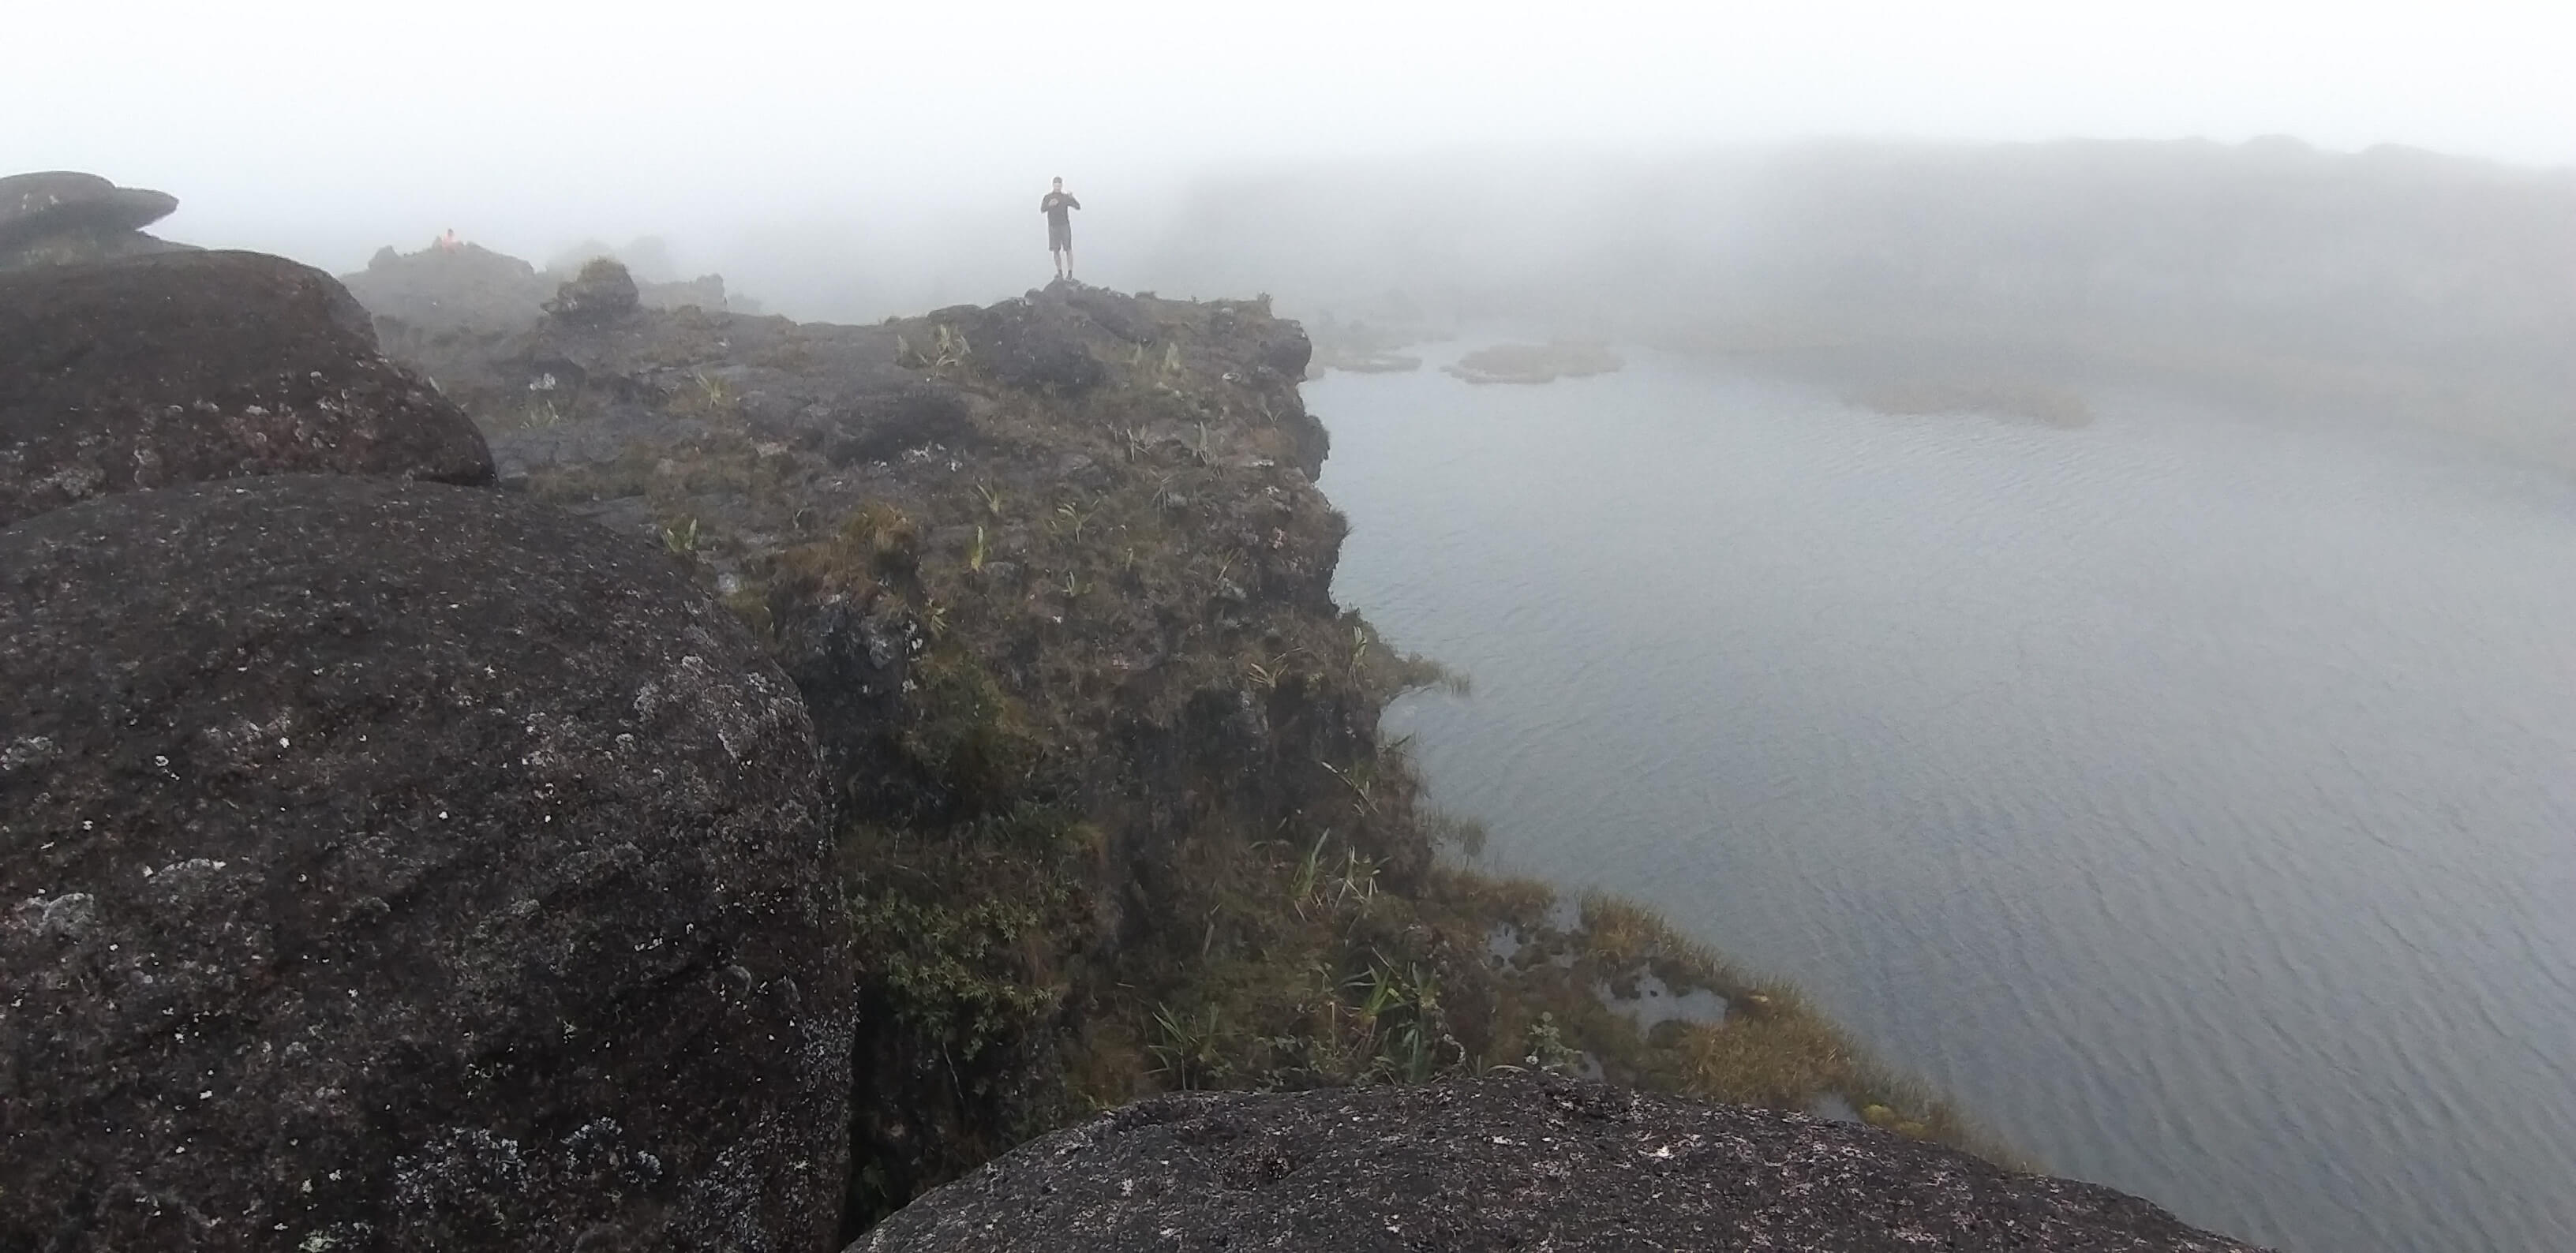 lago-gladys-monte-roraima-trekking